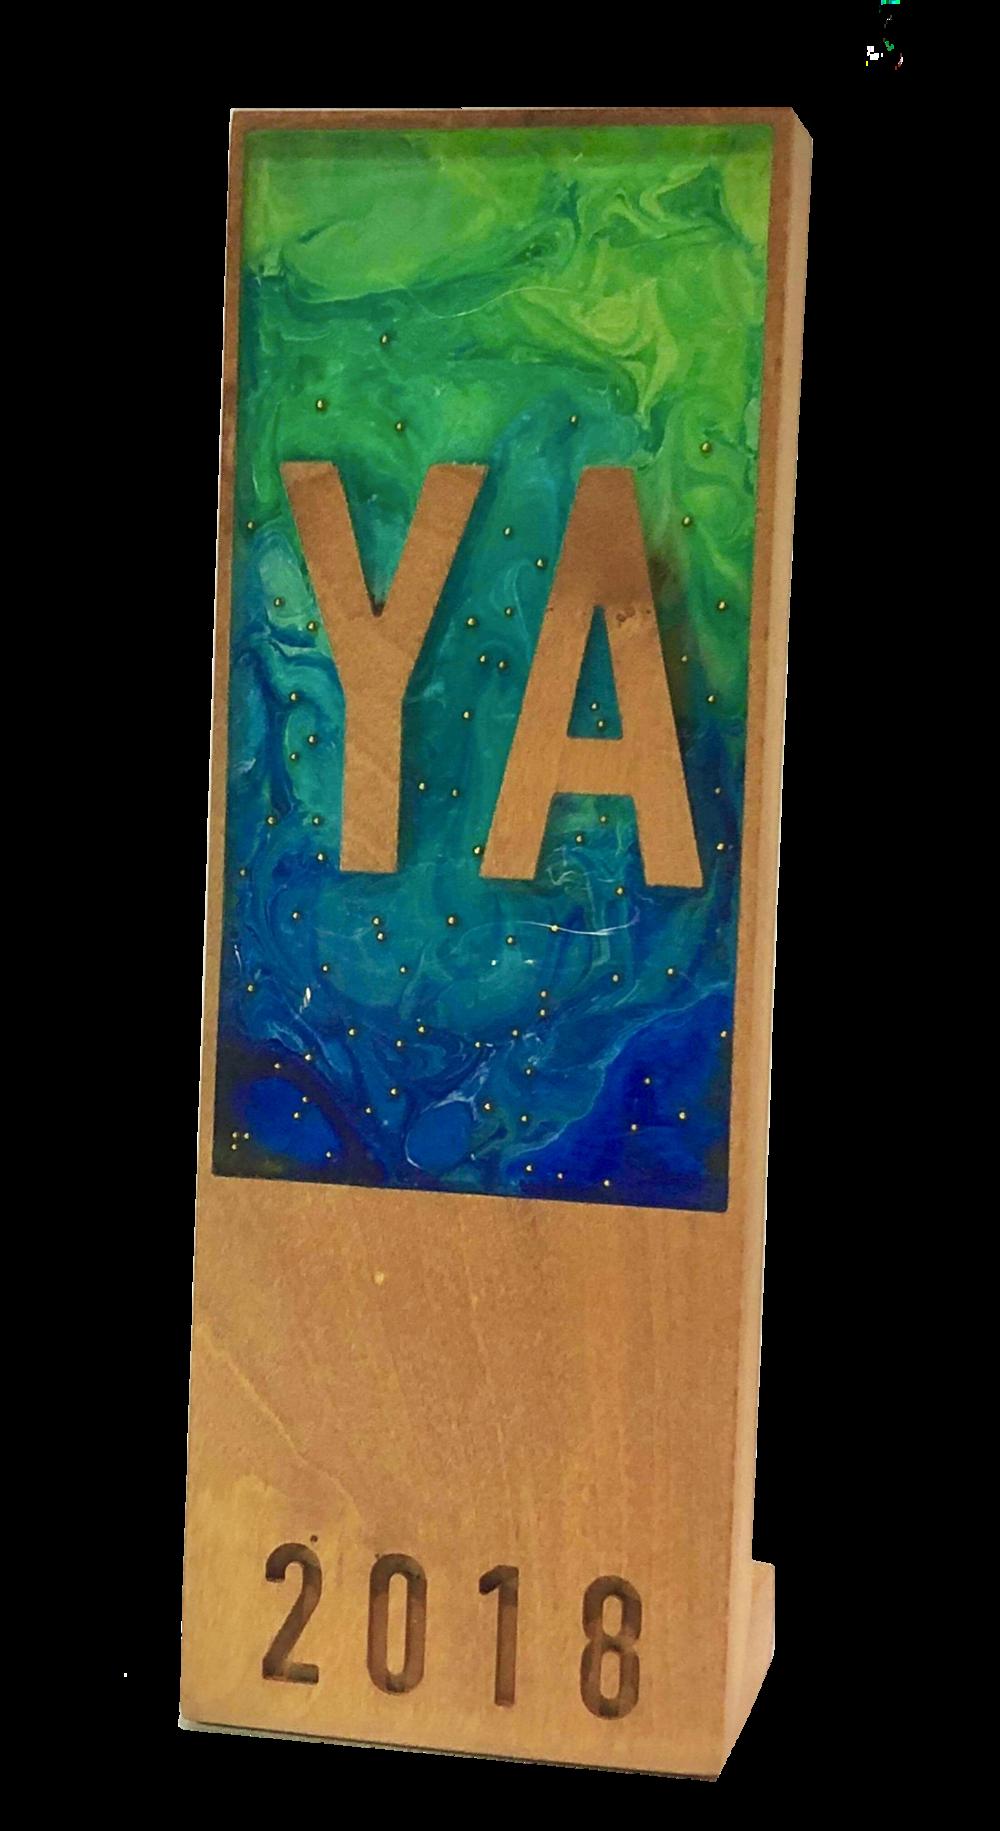 2018 YA Award designed by Sara Felix